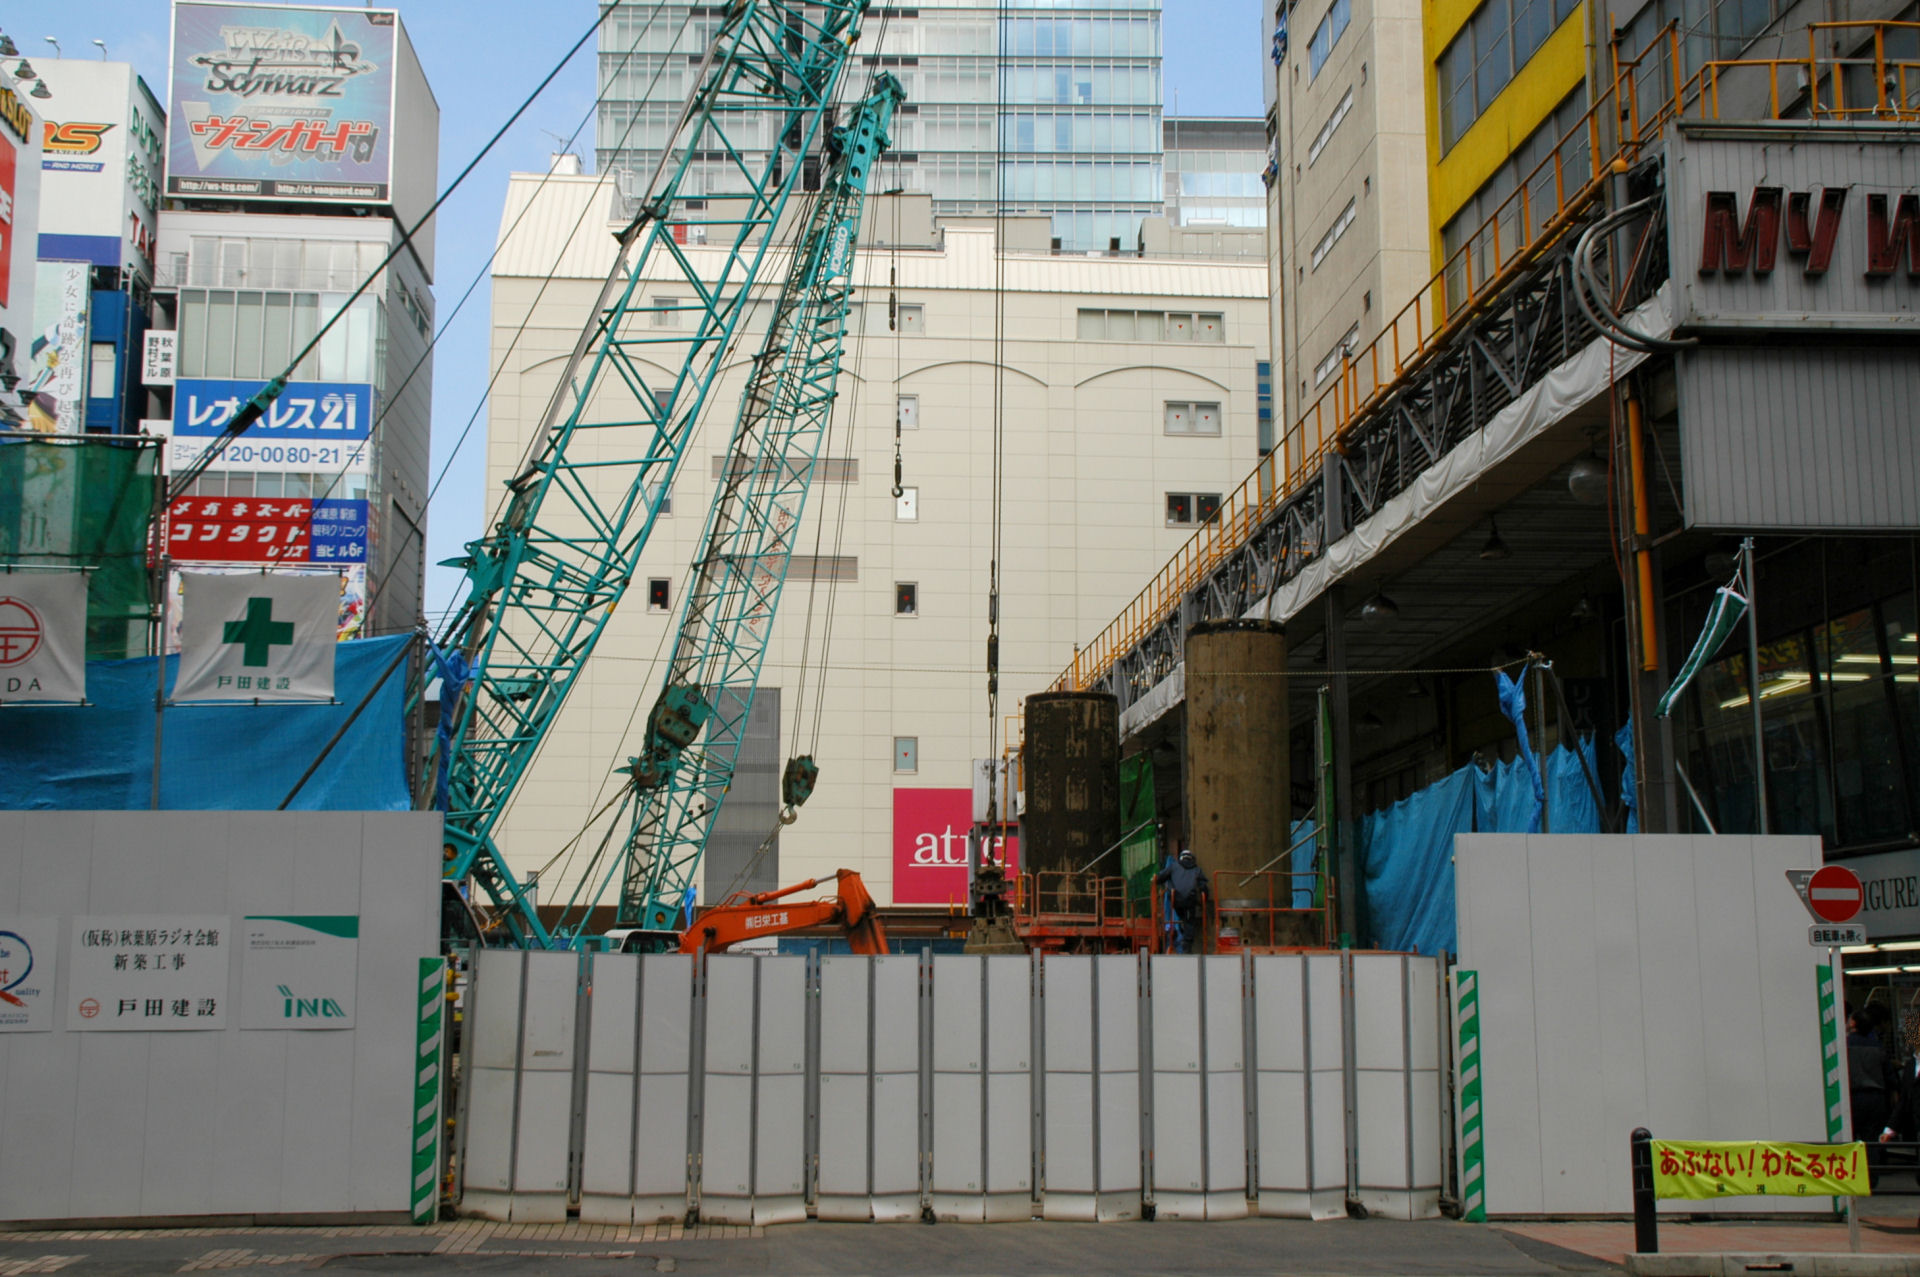 akibaradio0050e.jpg